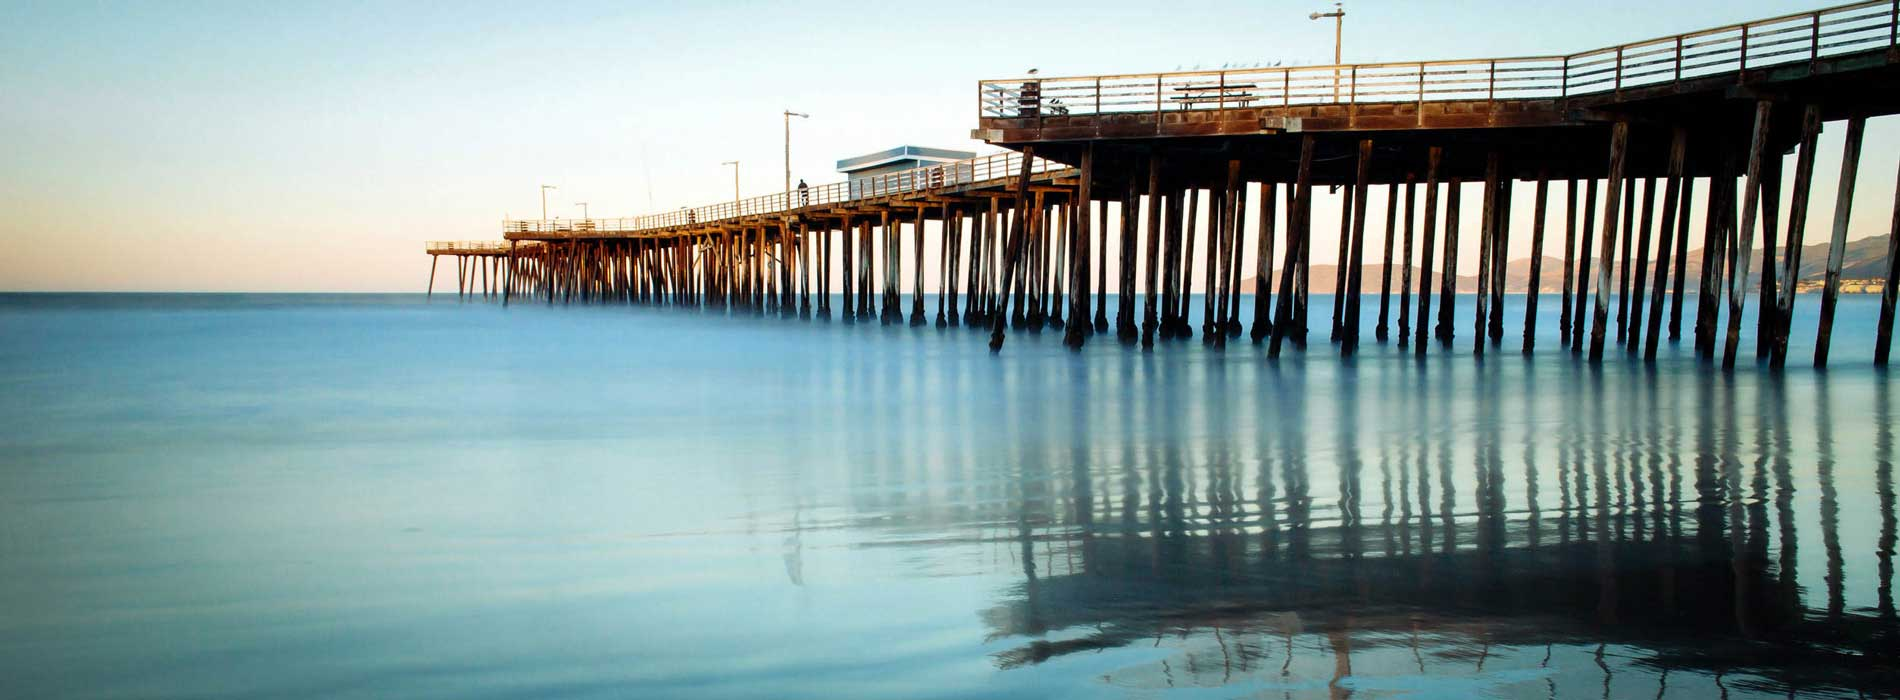 Beach N Bay Getaways Vacation Rentals In Morro Bay And